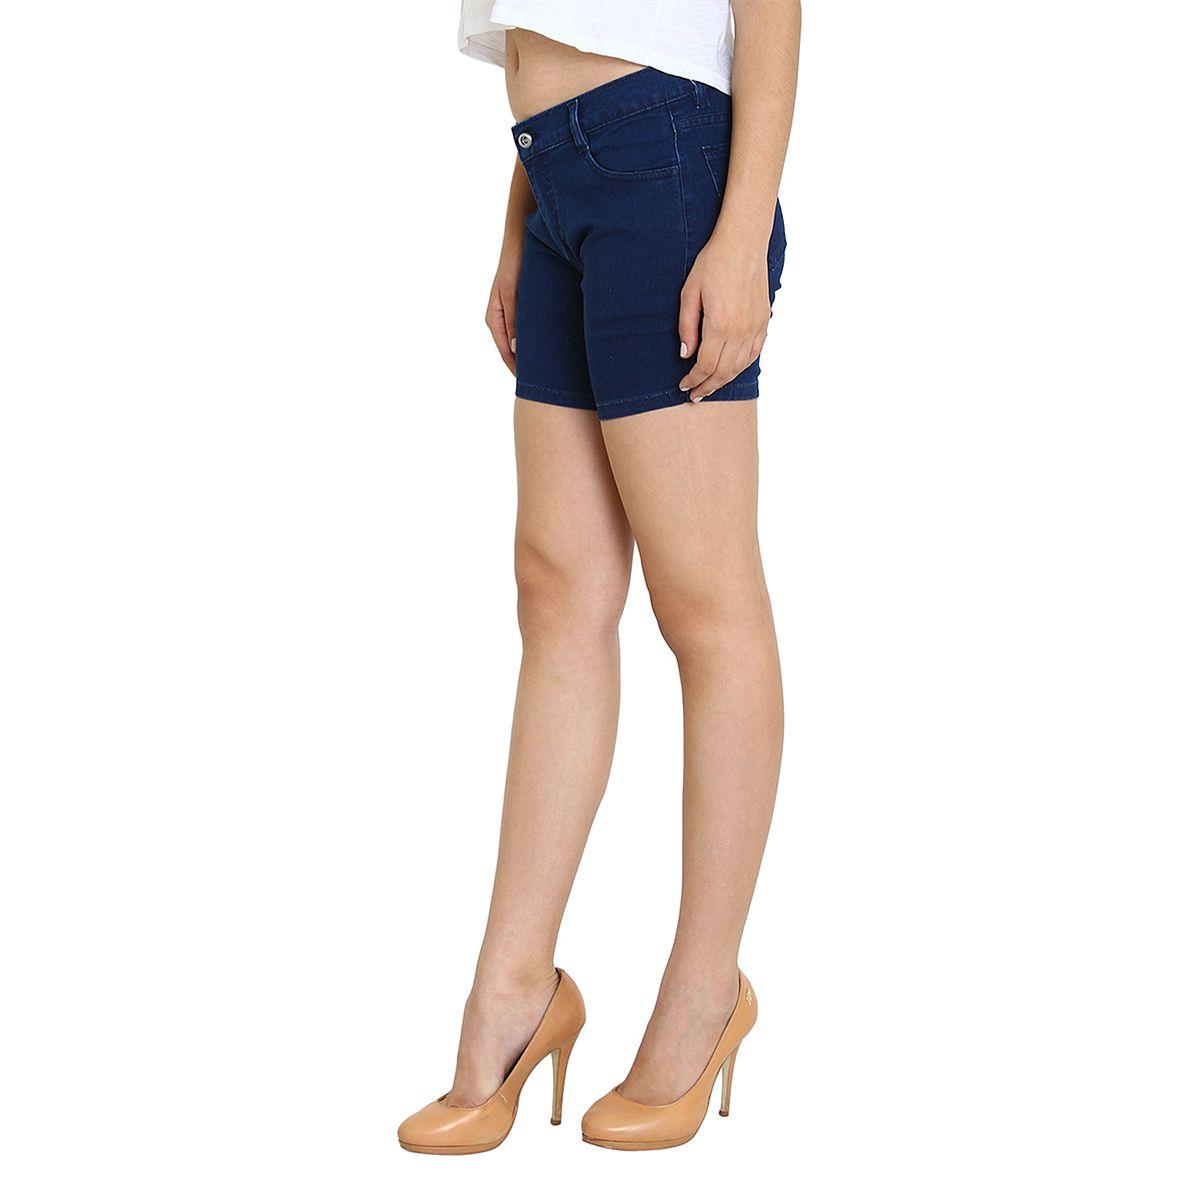 Fuego Fashion Wear Blue Shorts For Women-SHORT-1